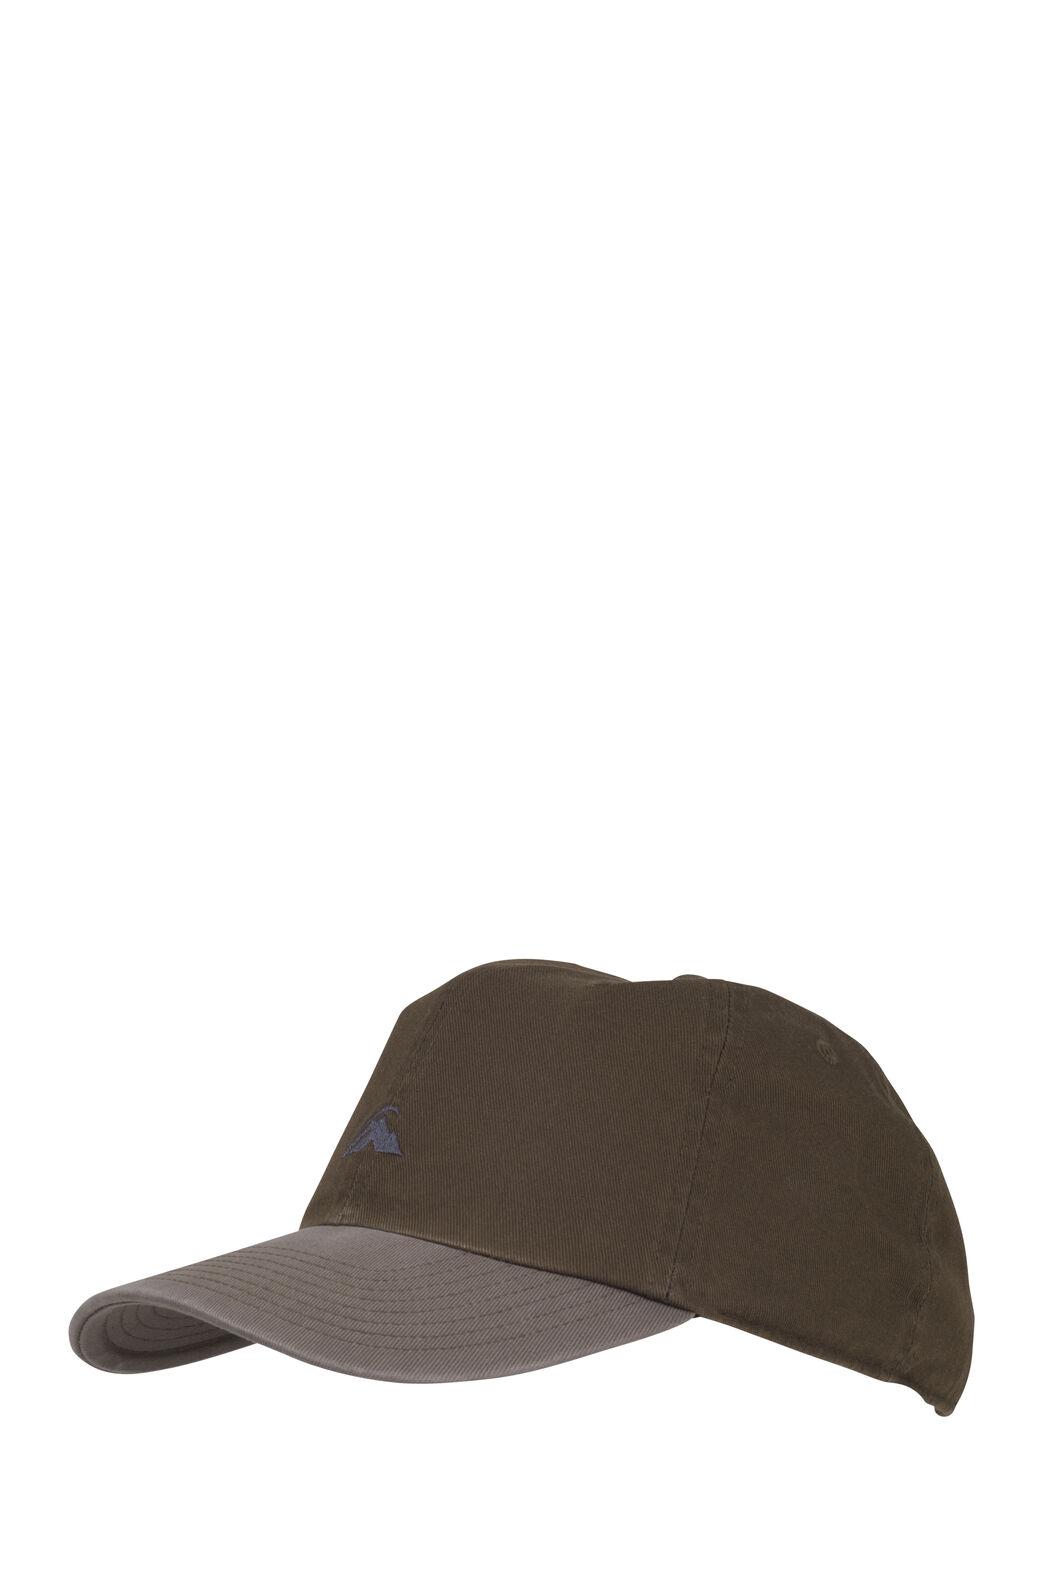 Macpac Vintage Cap, Covert Green/Peat, hi-res